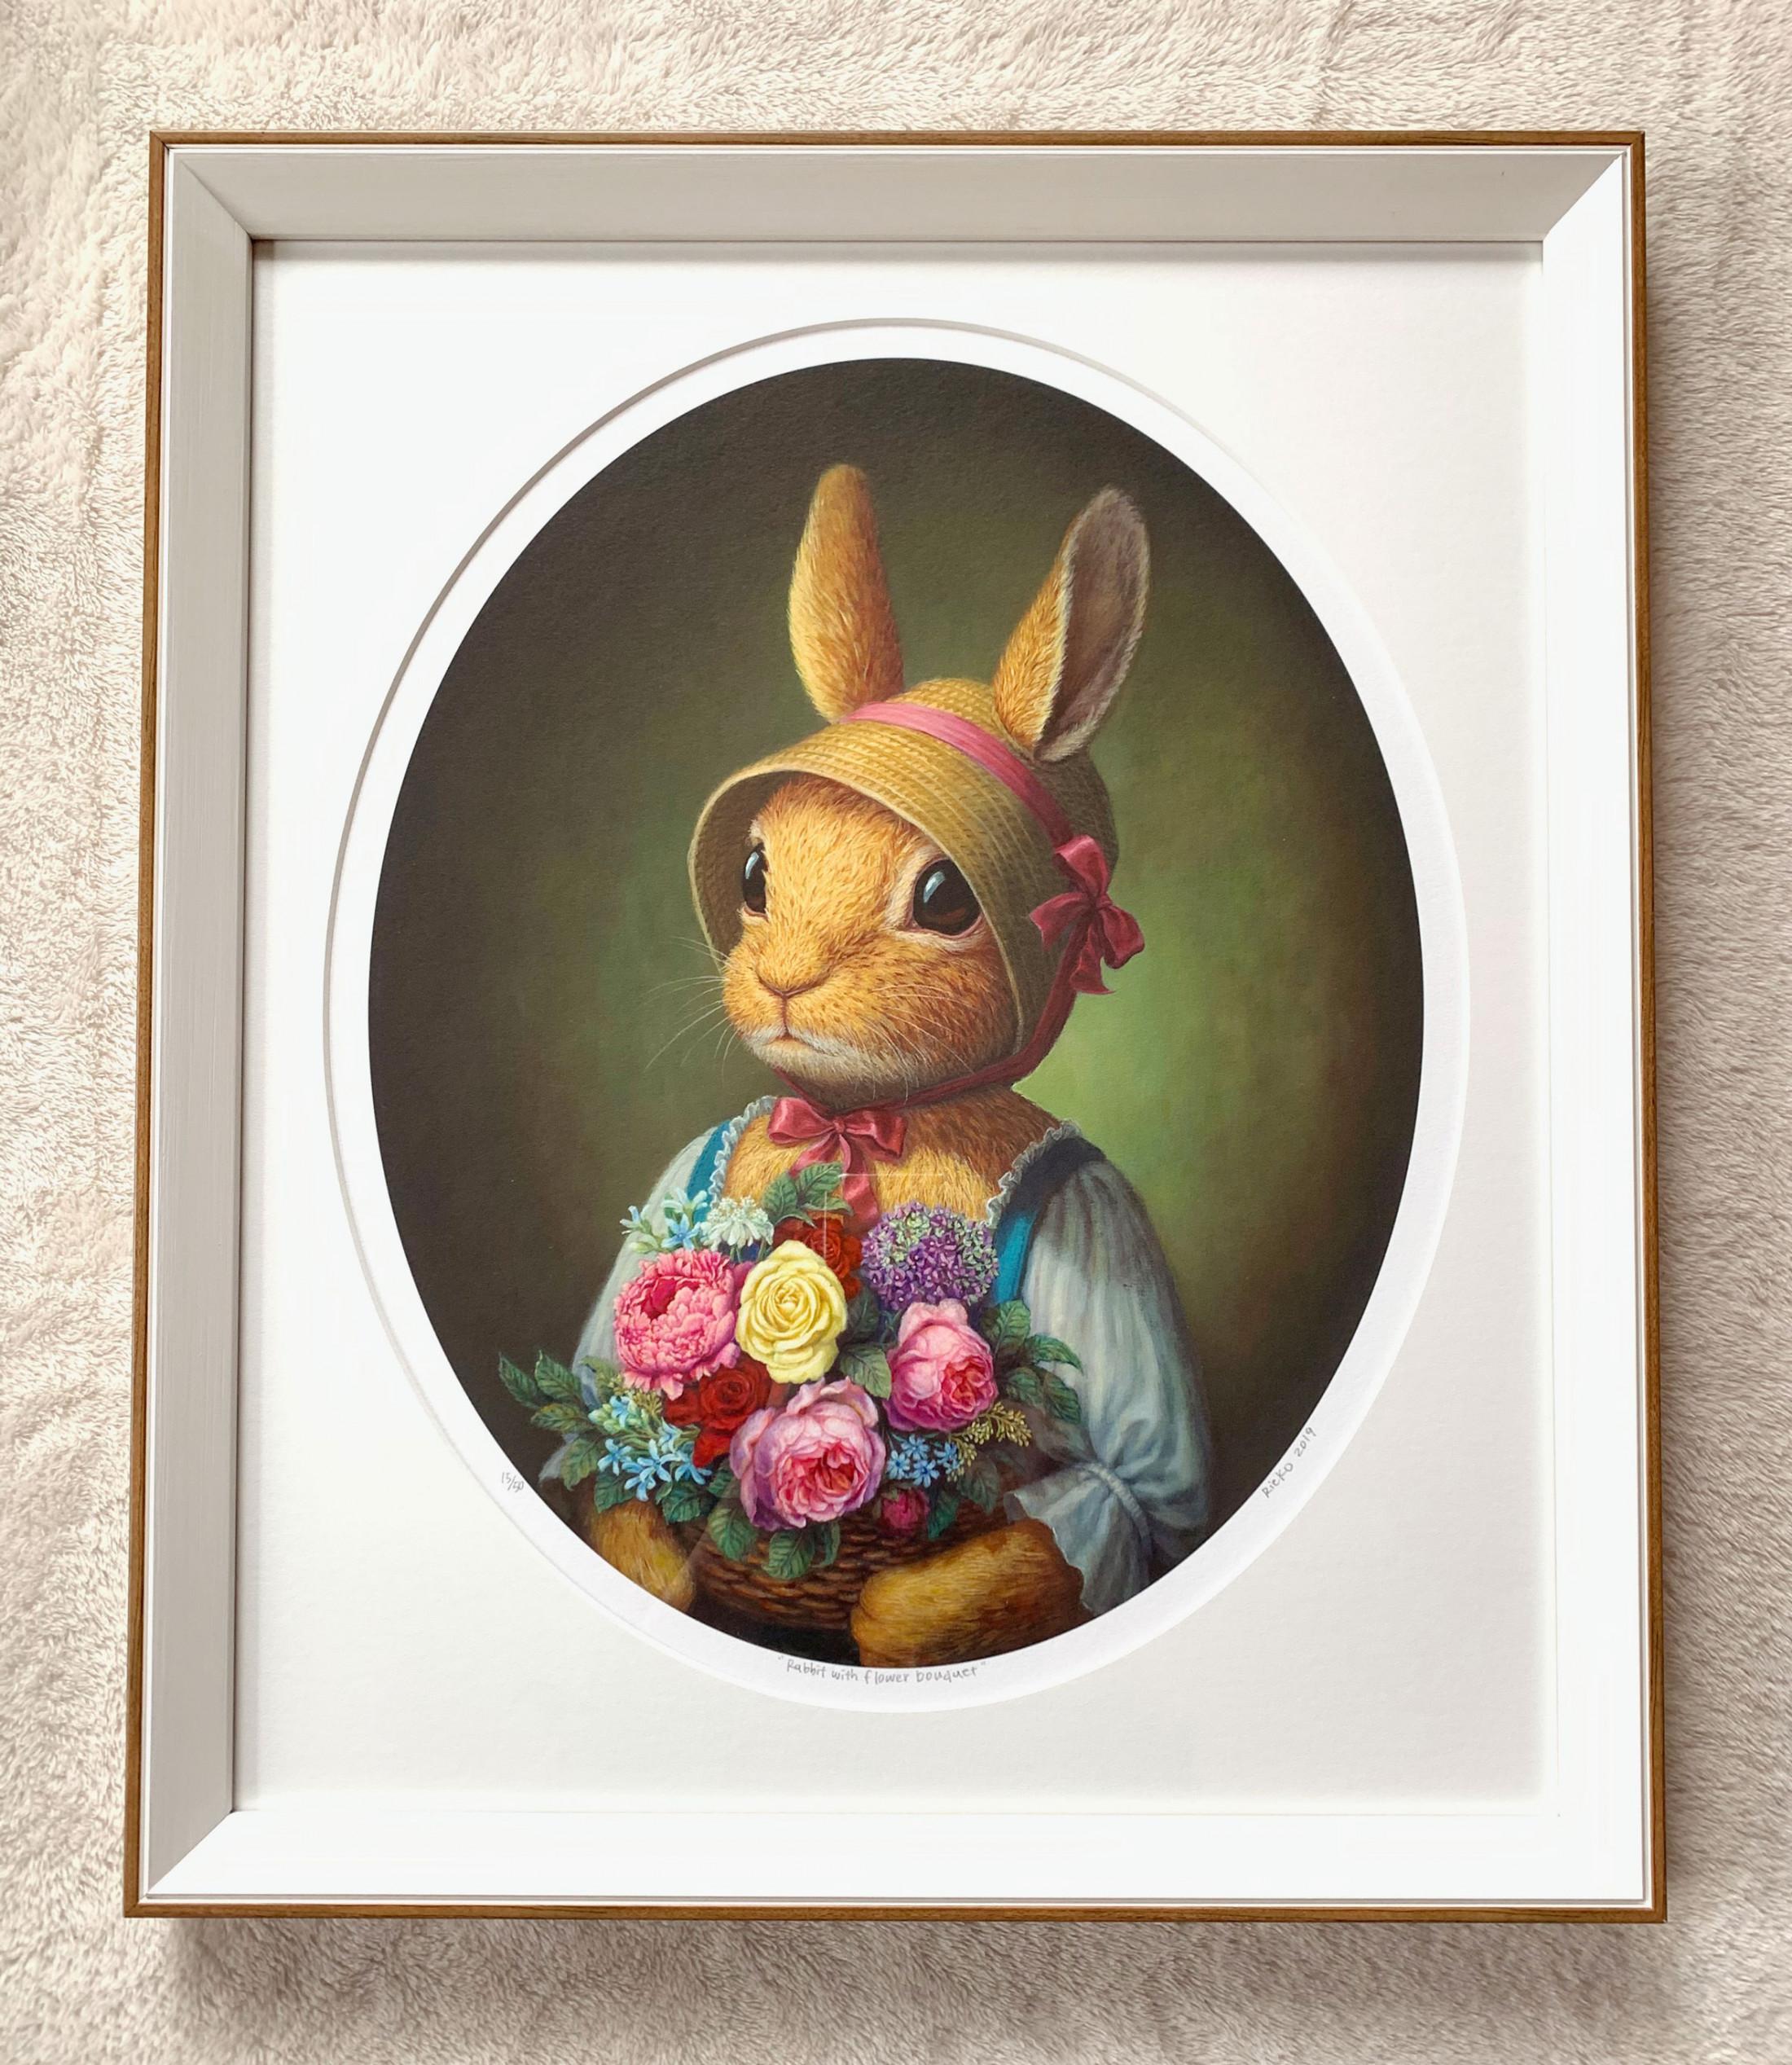 Rabbit with flower bouquet